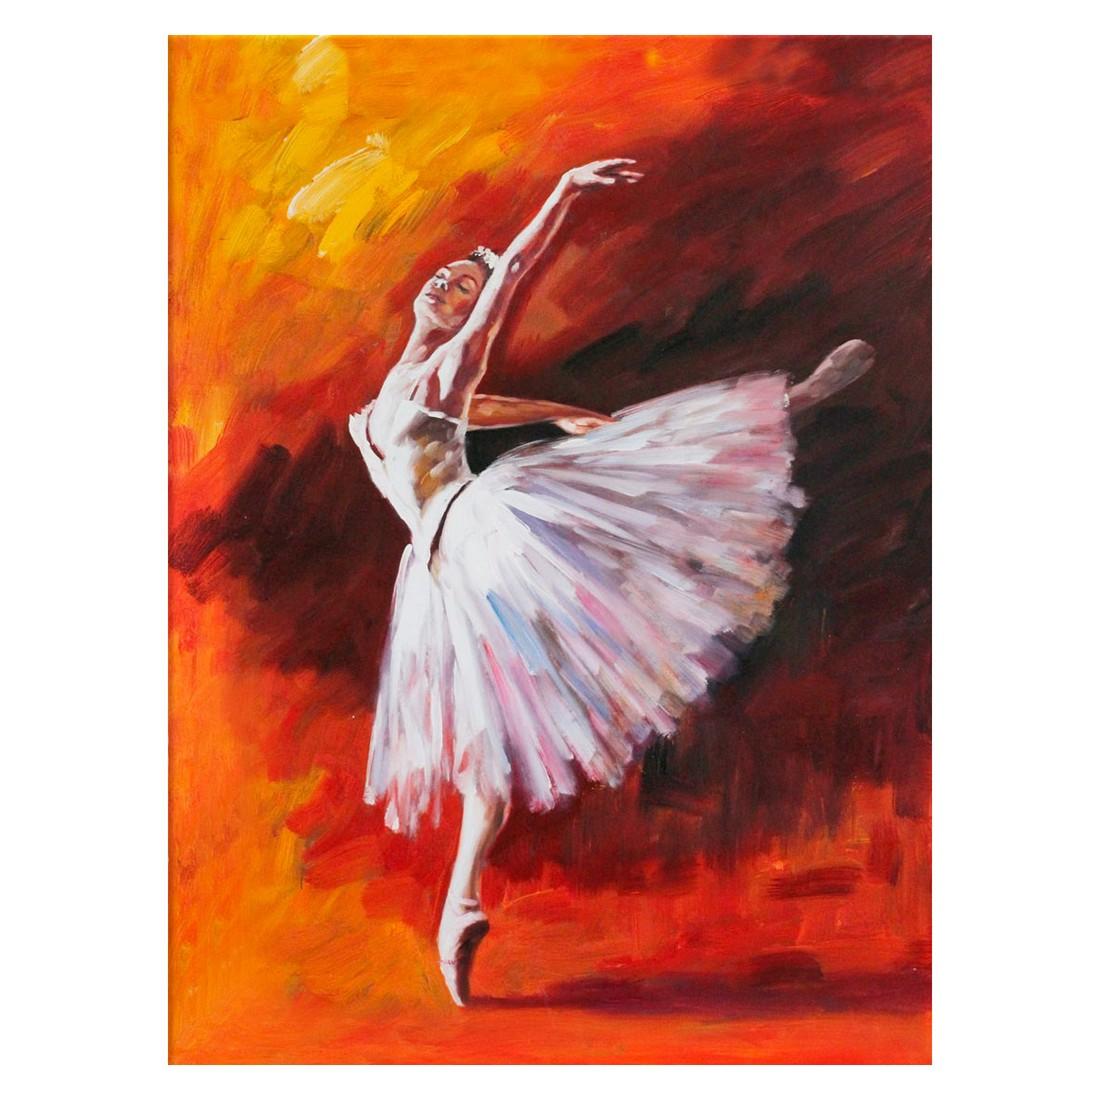 Ölgemälde Danseuse Violette – Größe 100 x 70 cm, yourPainting günstig bestellen